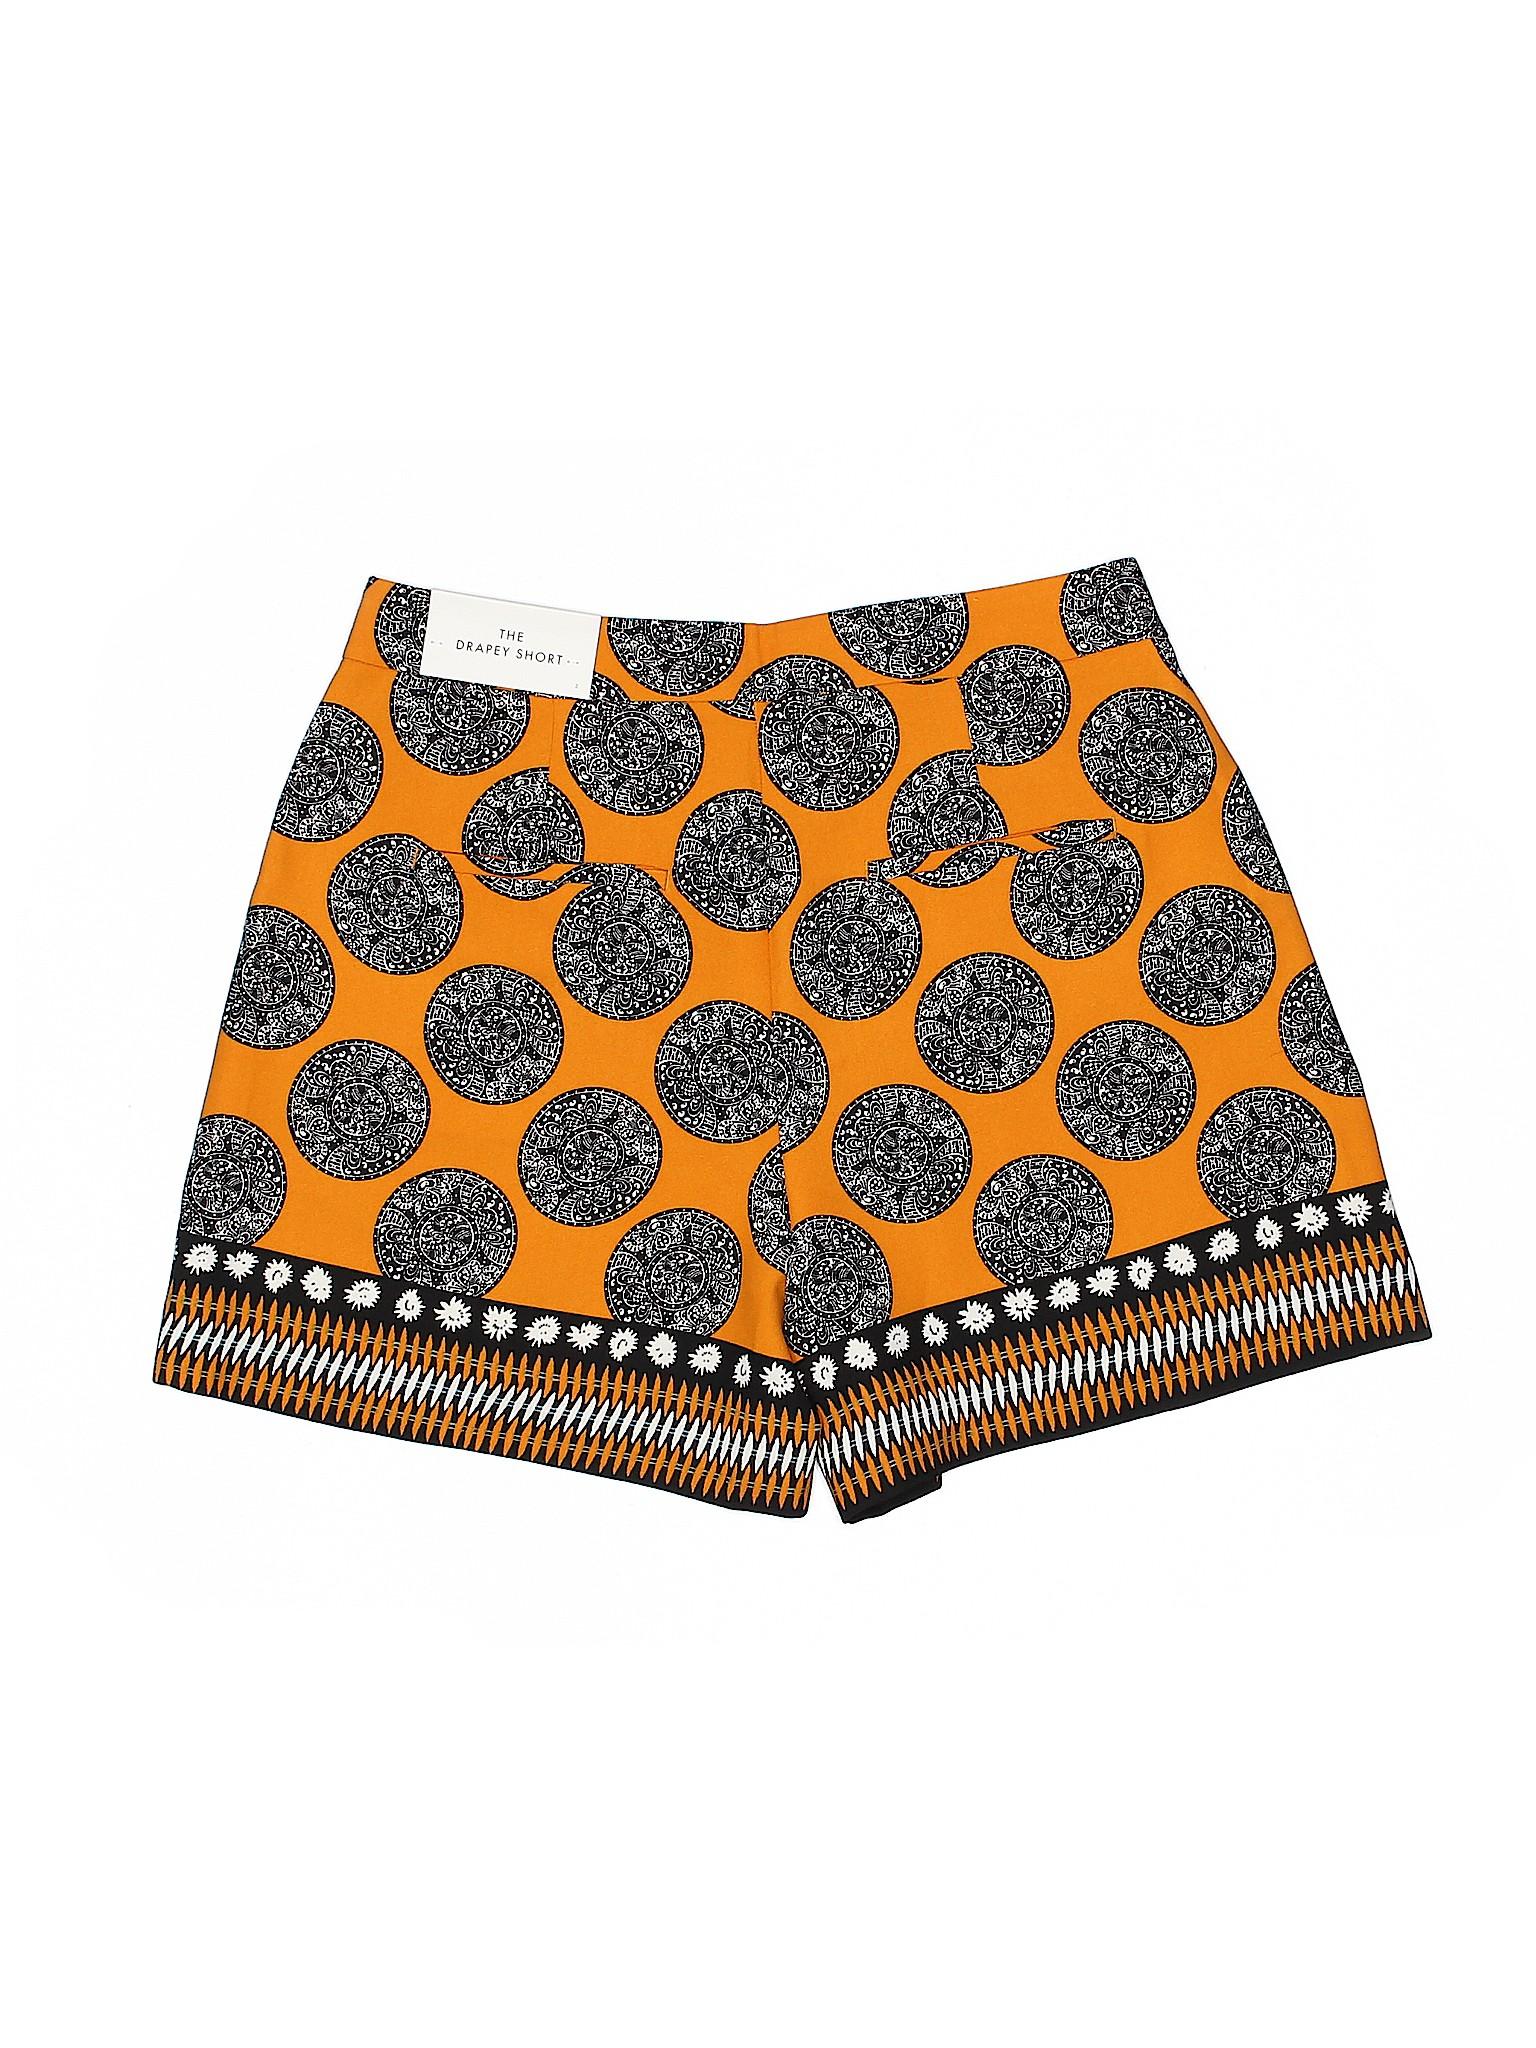 Shorts Ann Factory Boutique Taylor Ann Factory Boutique Taylor Shorts Boutique Ann AUz5w6Uqv